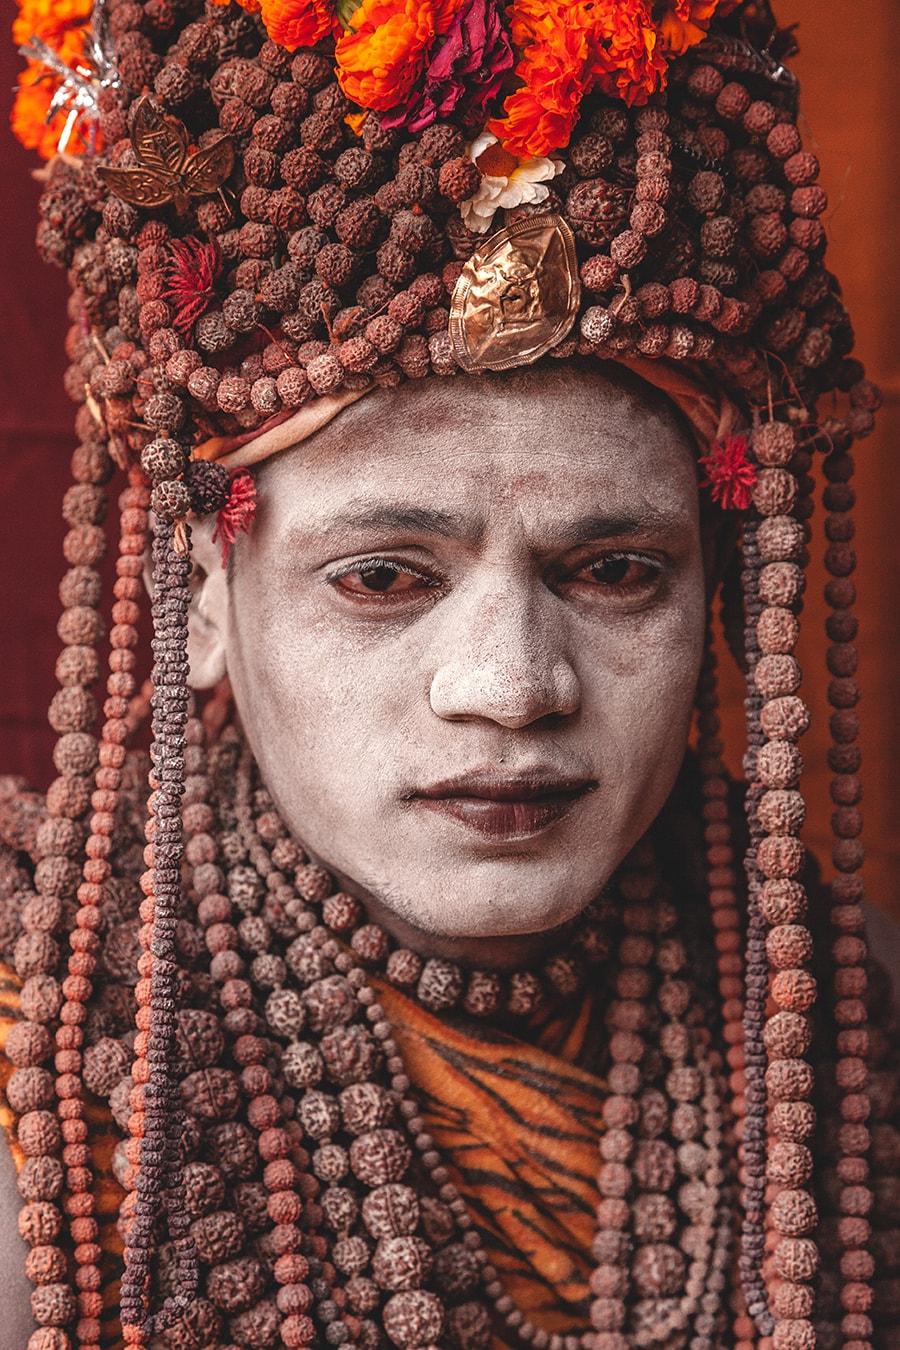 Naga Baba at the Maha Kumbh Mela in Allahbad, India.